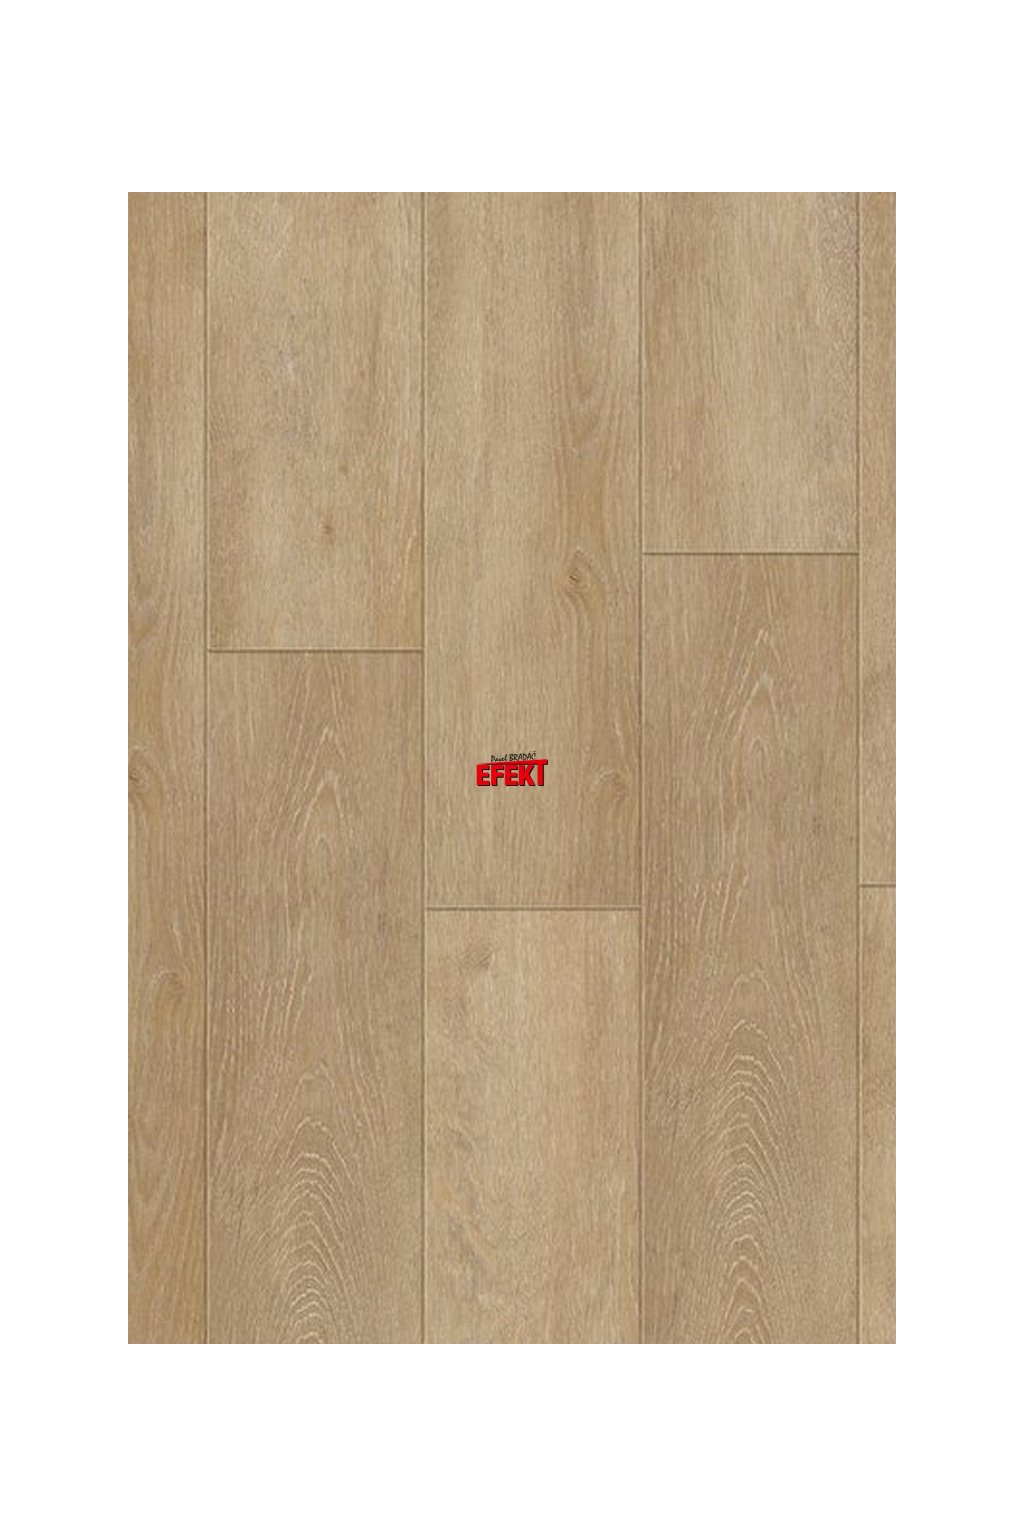 Gerflor Clic 55 Honey oak